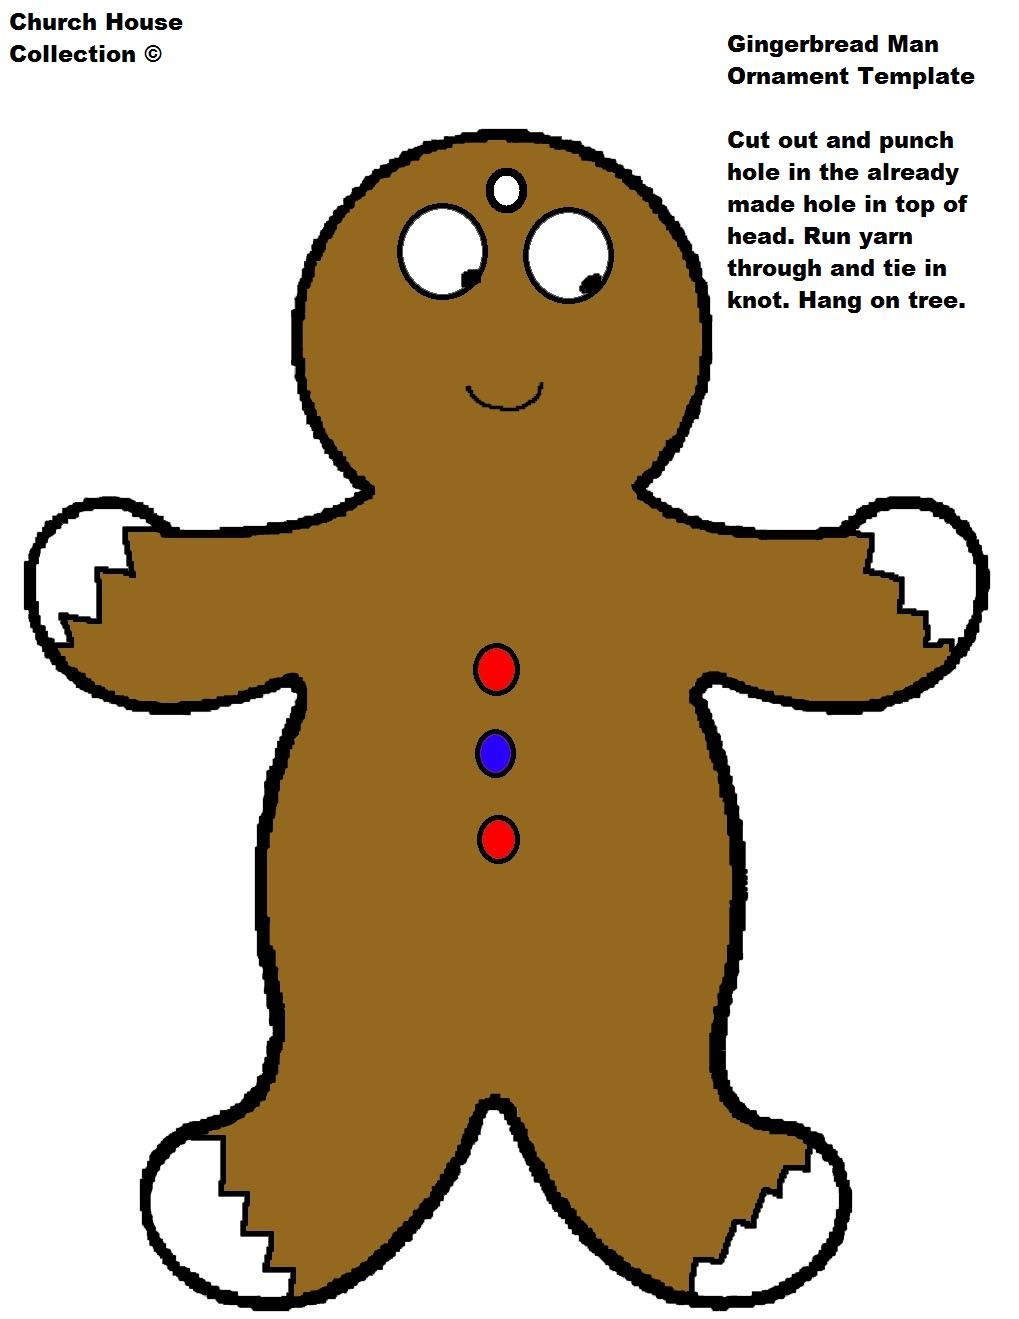 Gingerbread man ornaments - Large Gingerbread Man Ornament Template